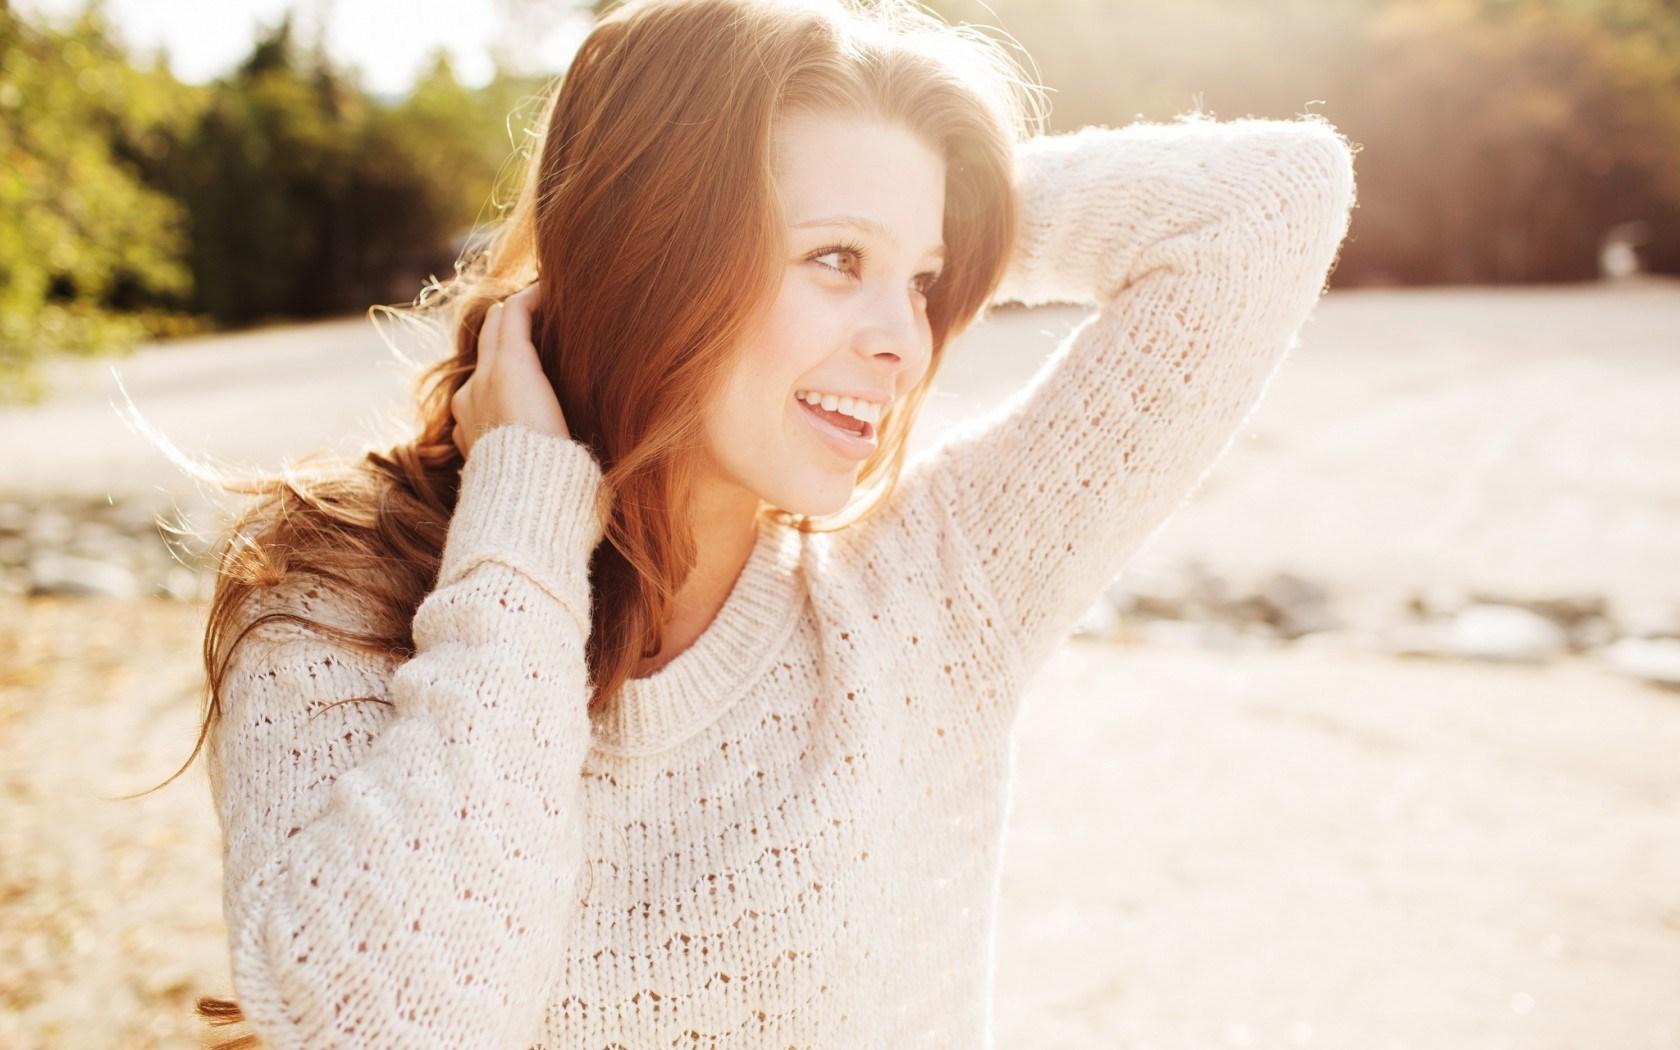 Girl Smile Sweater